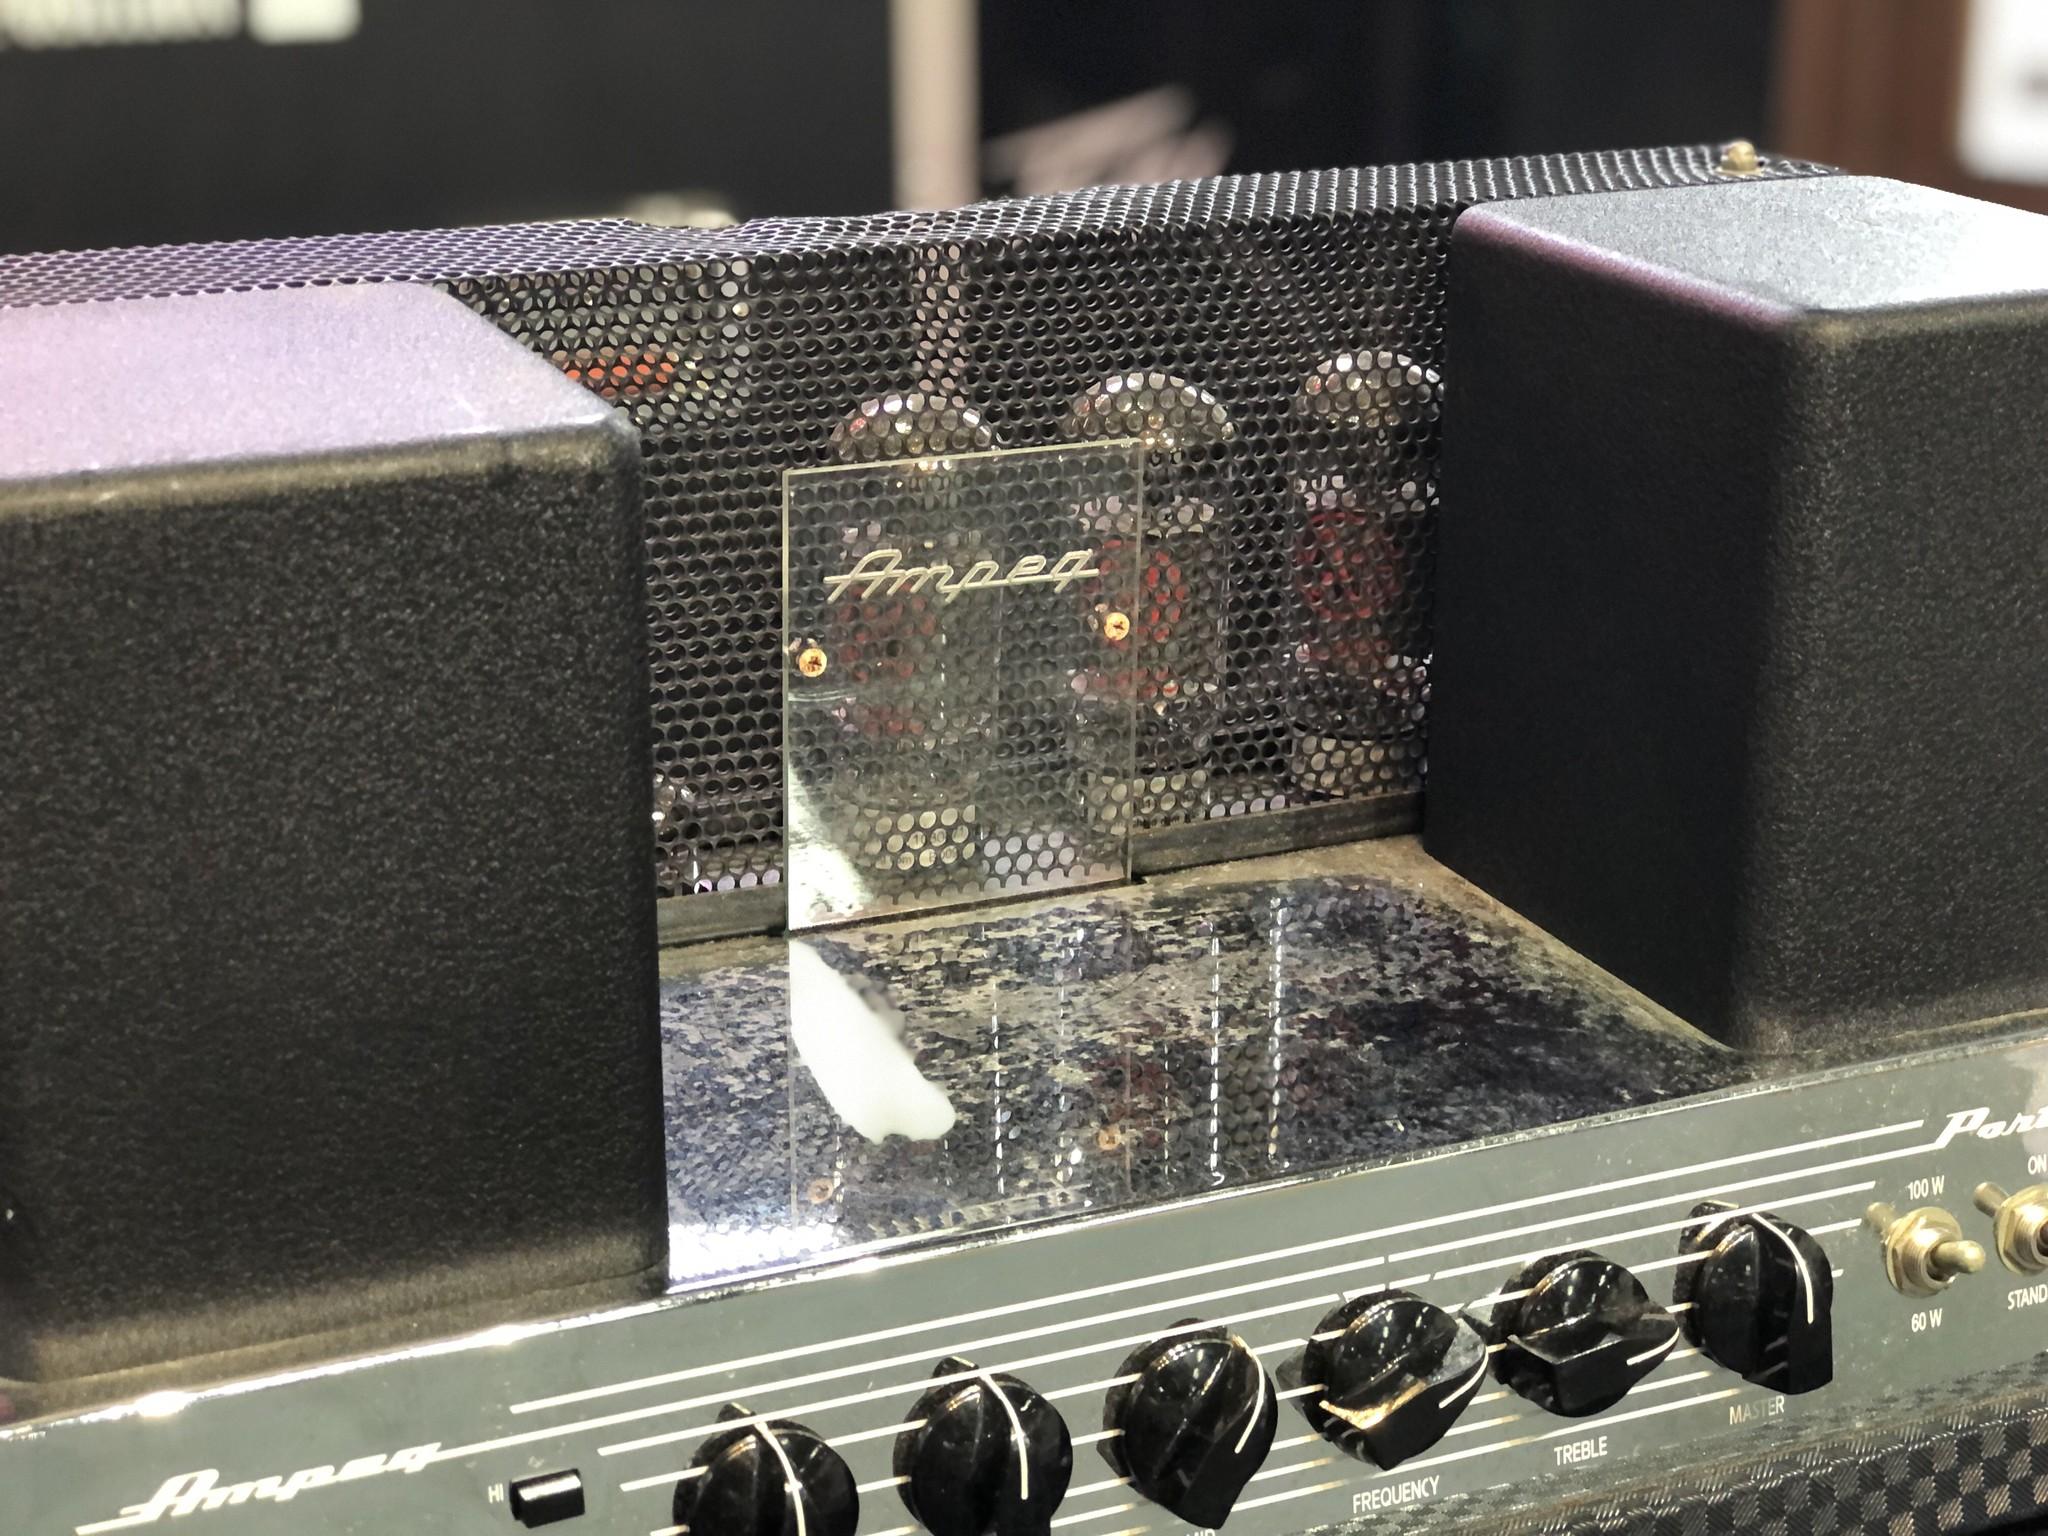 Ampeg B-15R Portaflex Amp and Cabinet-6